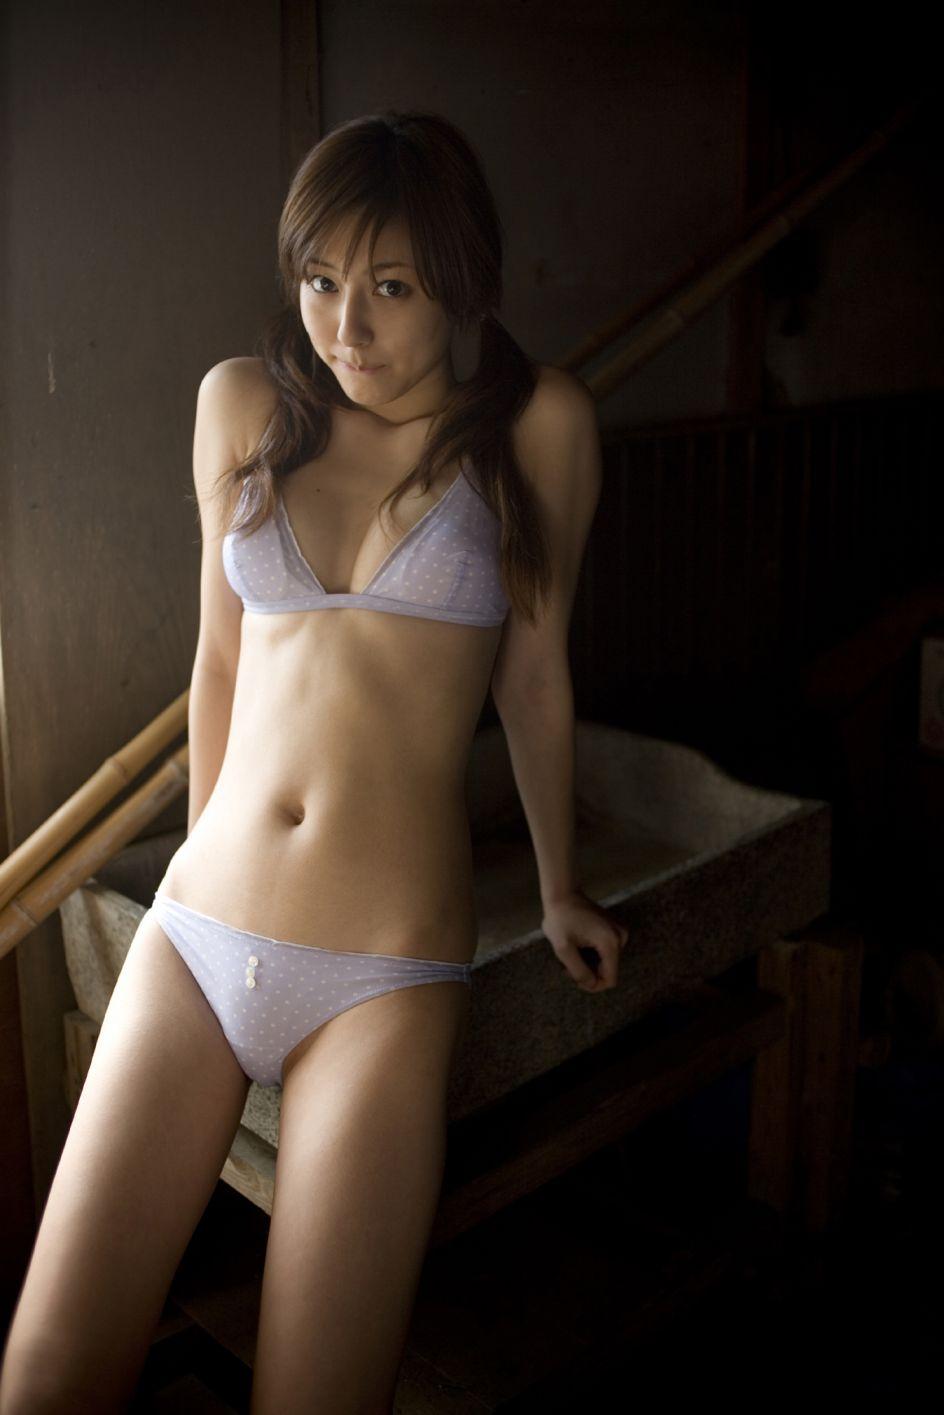 http://blog.cnobi.jp/v1/blog/user/a8c5c06266ed65ea9b67299e90592fa7/1294468587